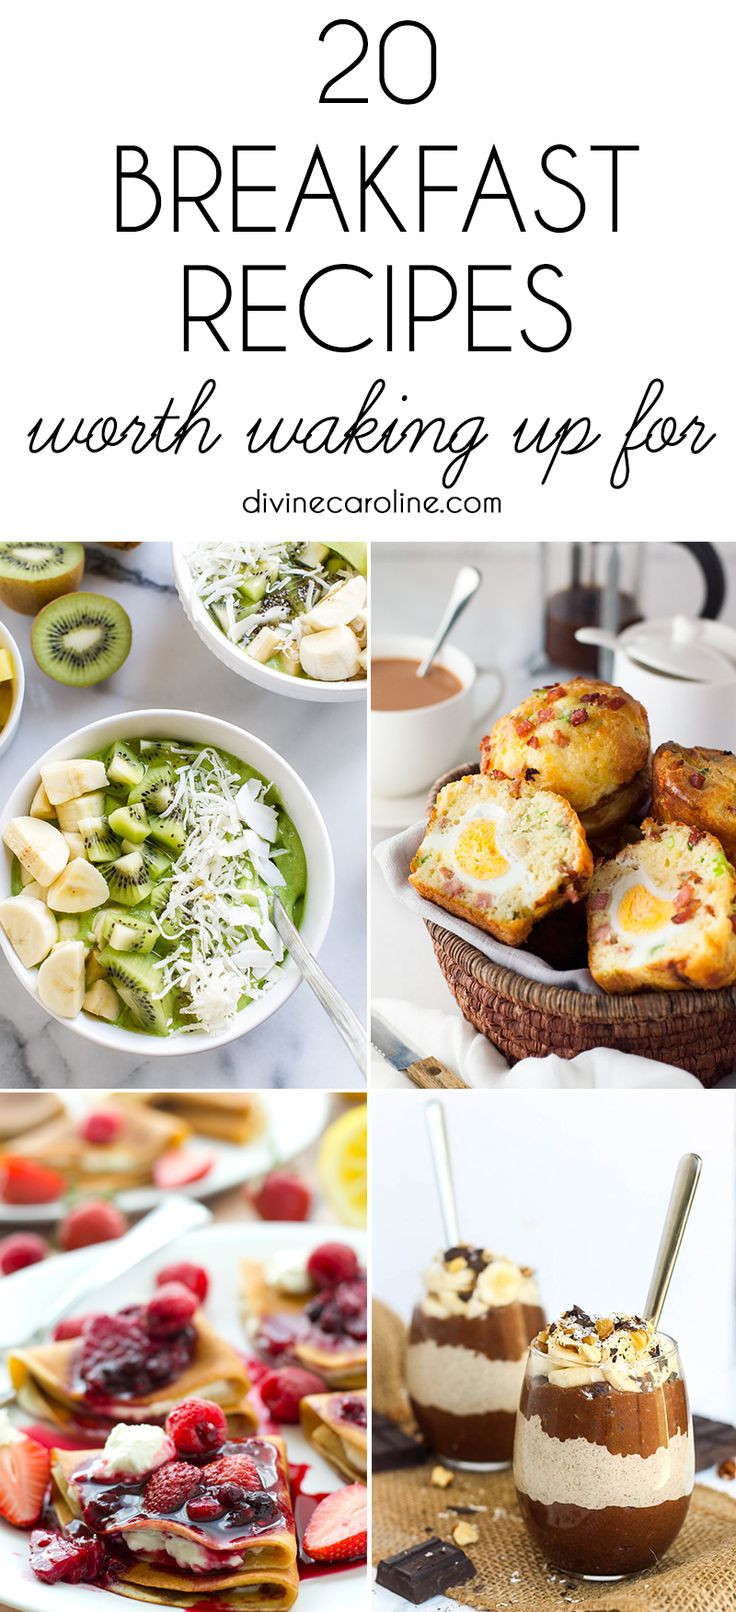 Most Healthy Breakfast  314 curated Yummy Healthy Breakfast Ideas ideas by